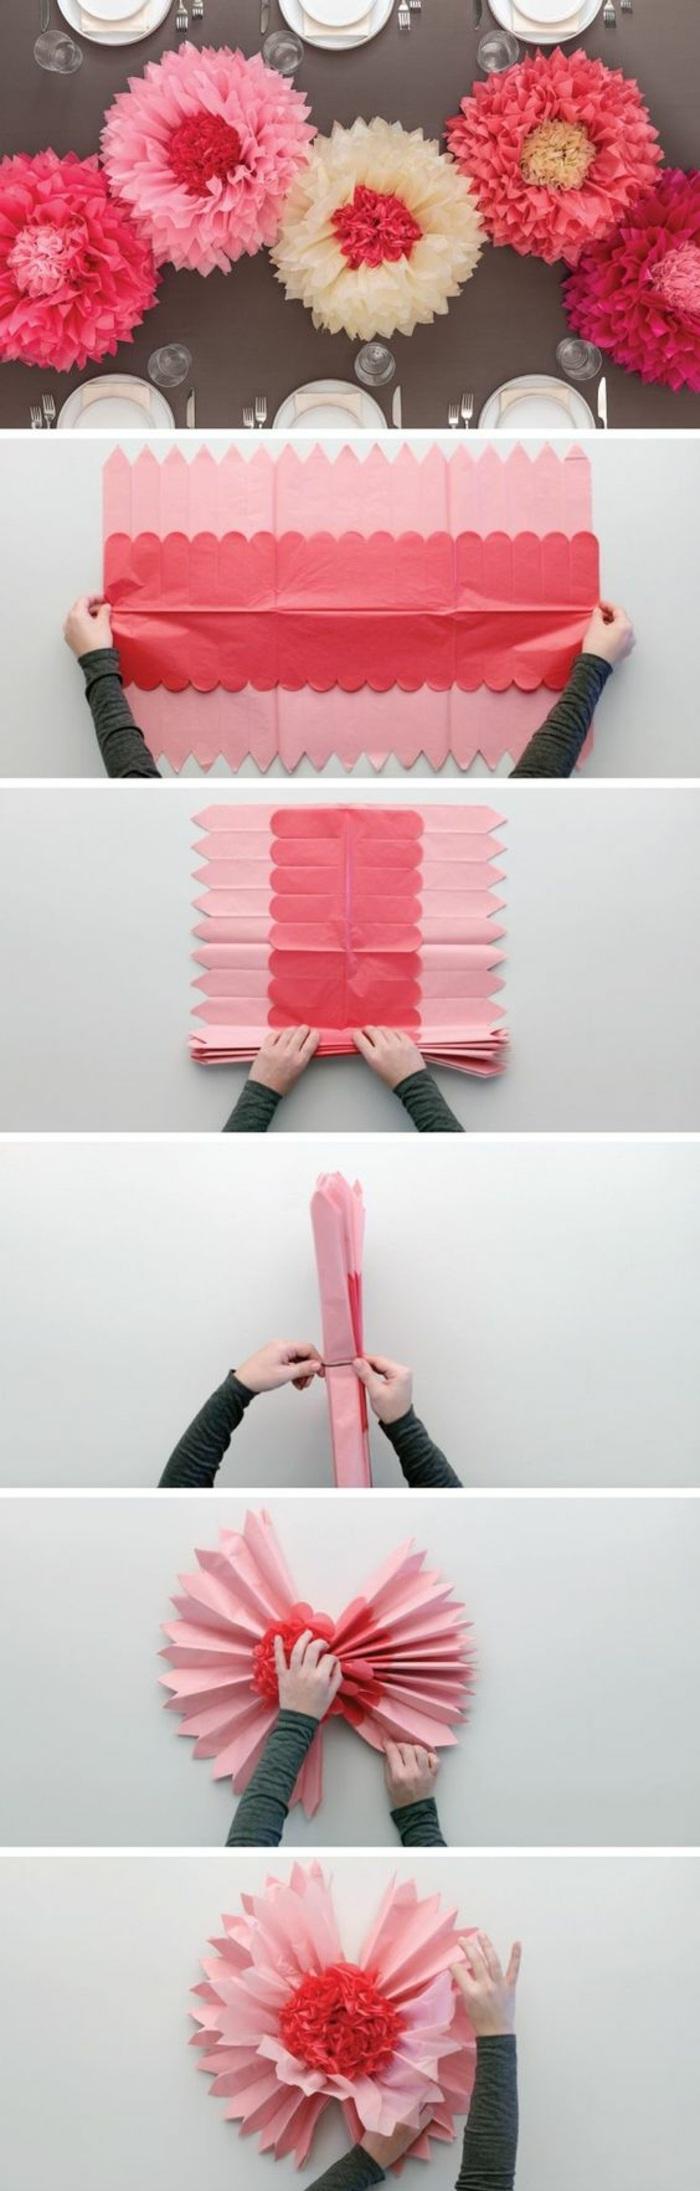 wanddeko selber machen, rosa blumen aus papier